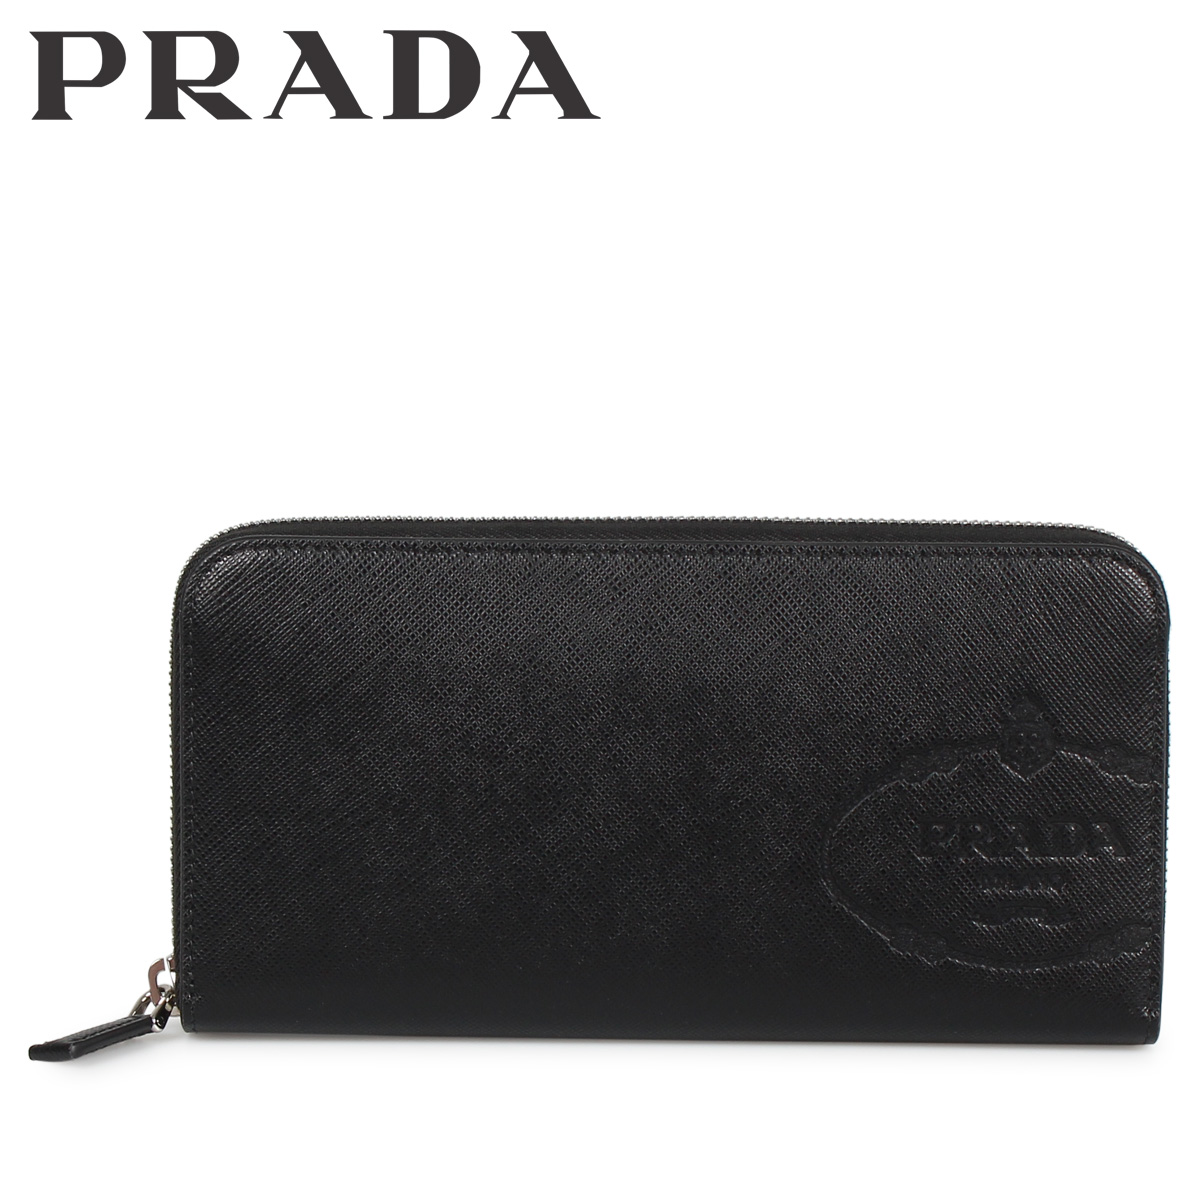 PRADA プラダ 財布 長財布 メンズ レディース サフィアーノ ラウンドファスナー ZIP AROUND NODO SAVOIA ブラック 黒 2ML3172MB8